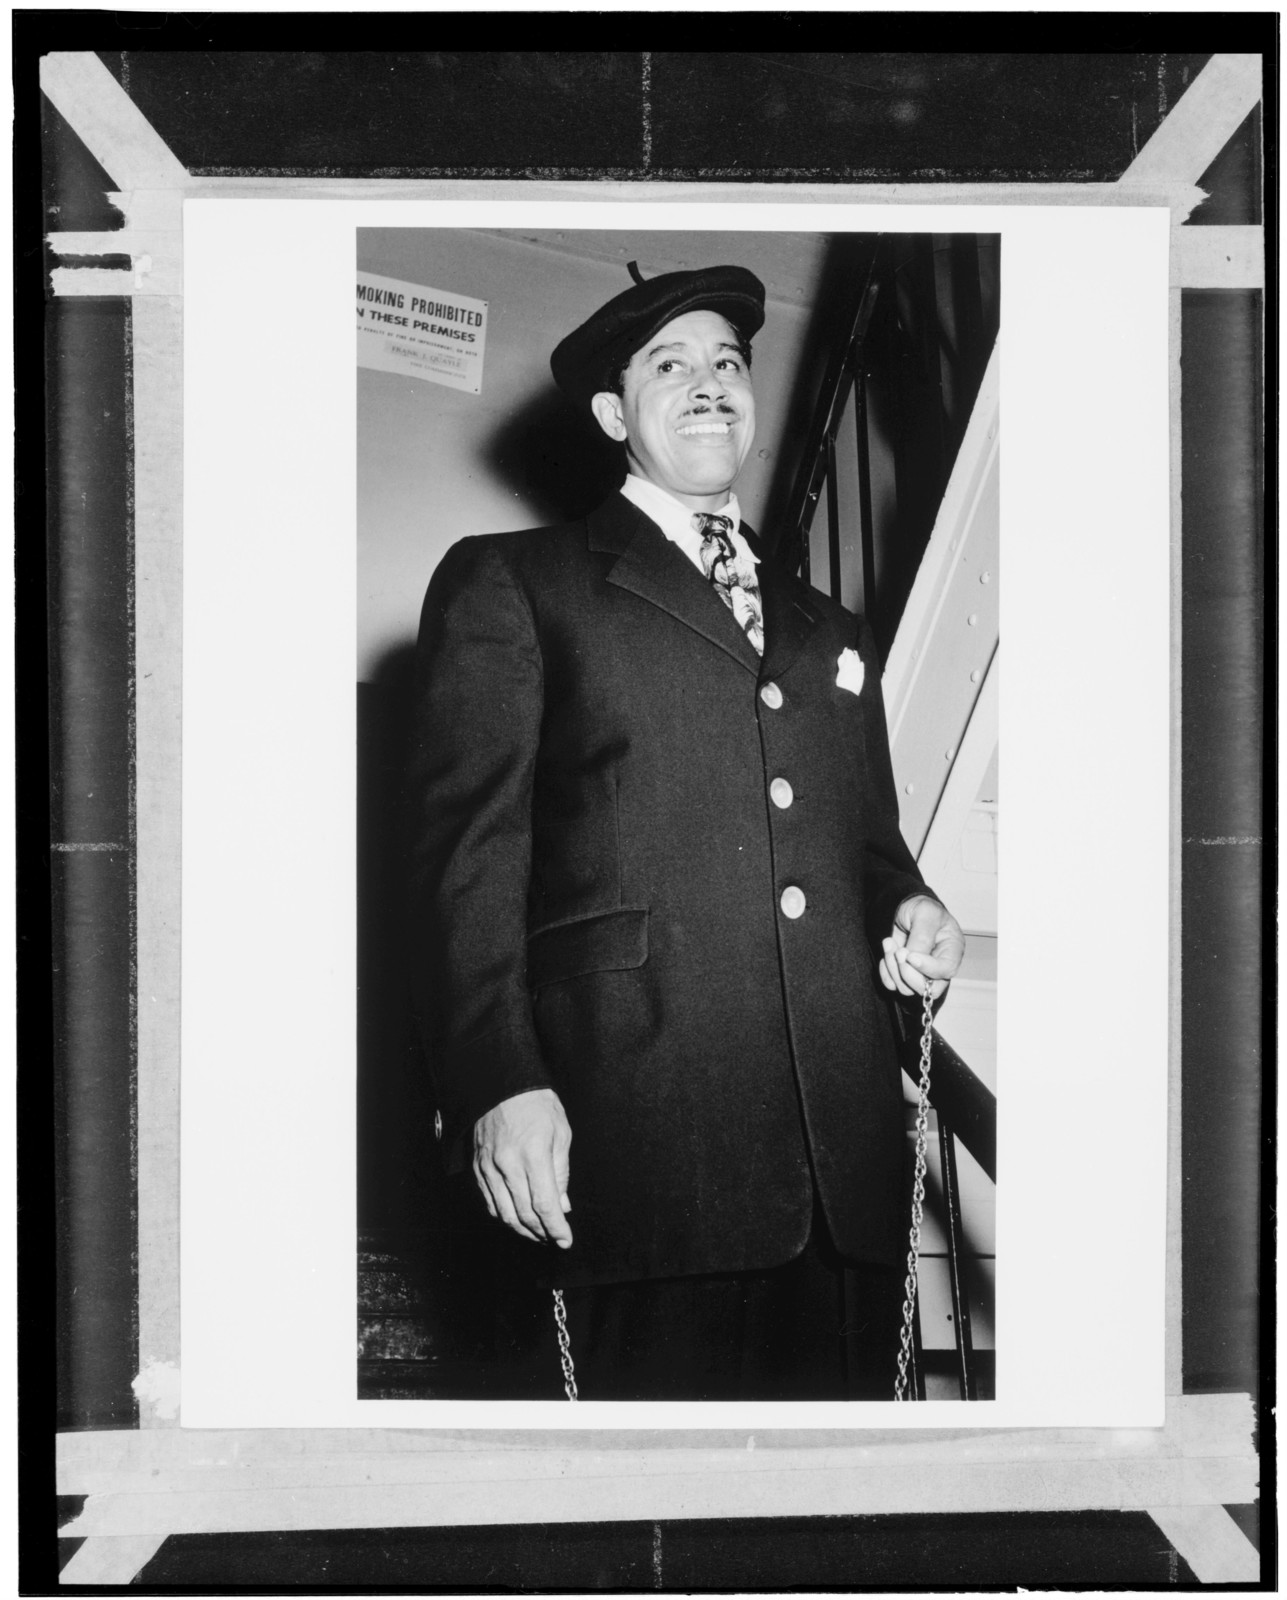 [Portrait of Cab Calloway, Strand Theater, New York, N.Y., ca. Mar. 1947]